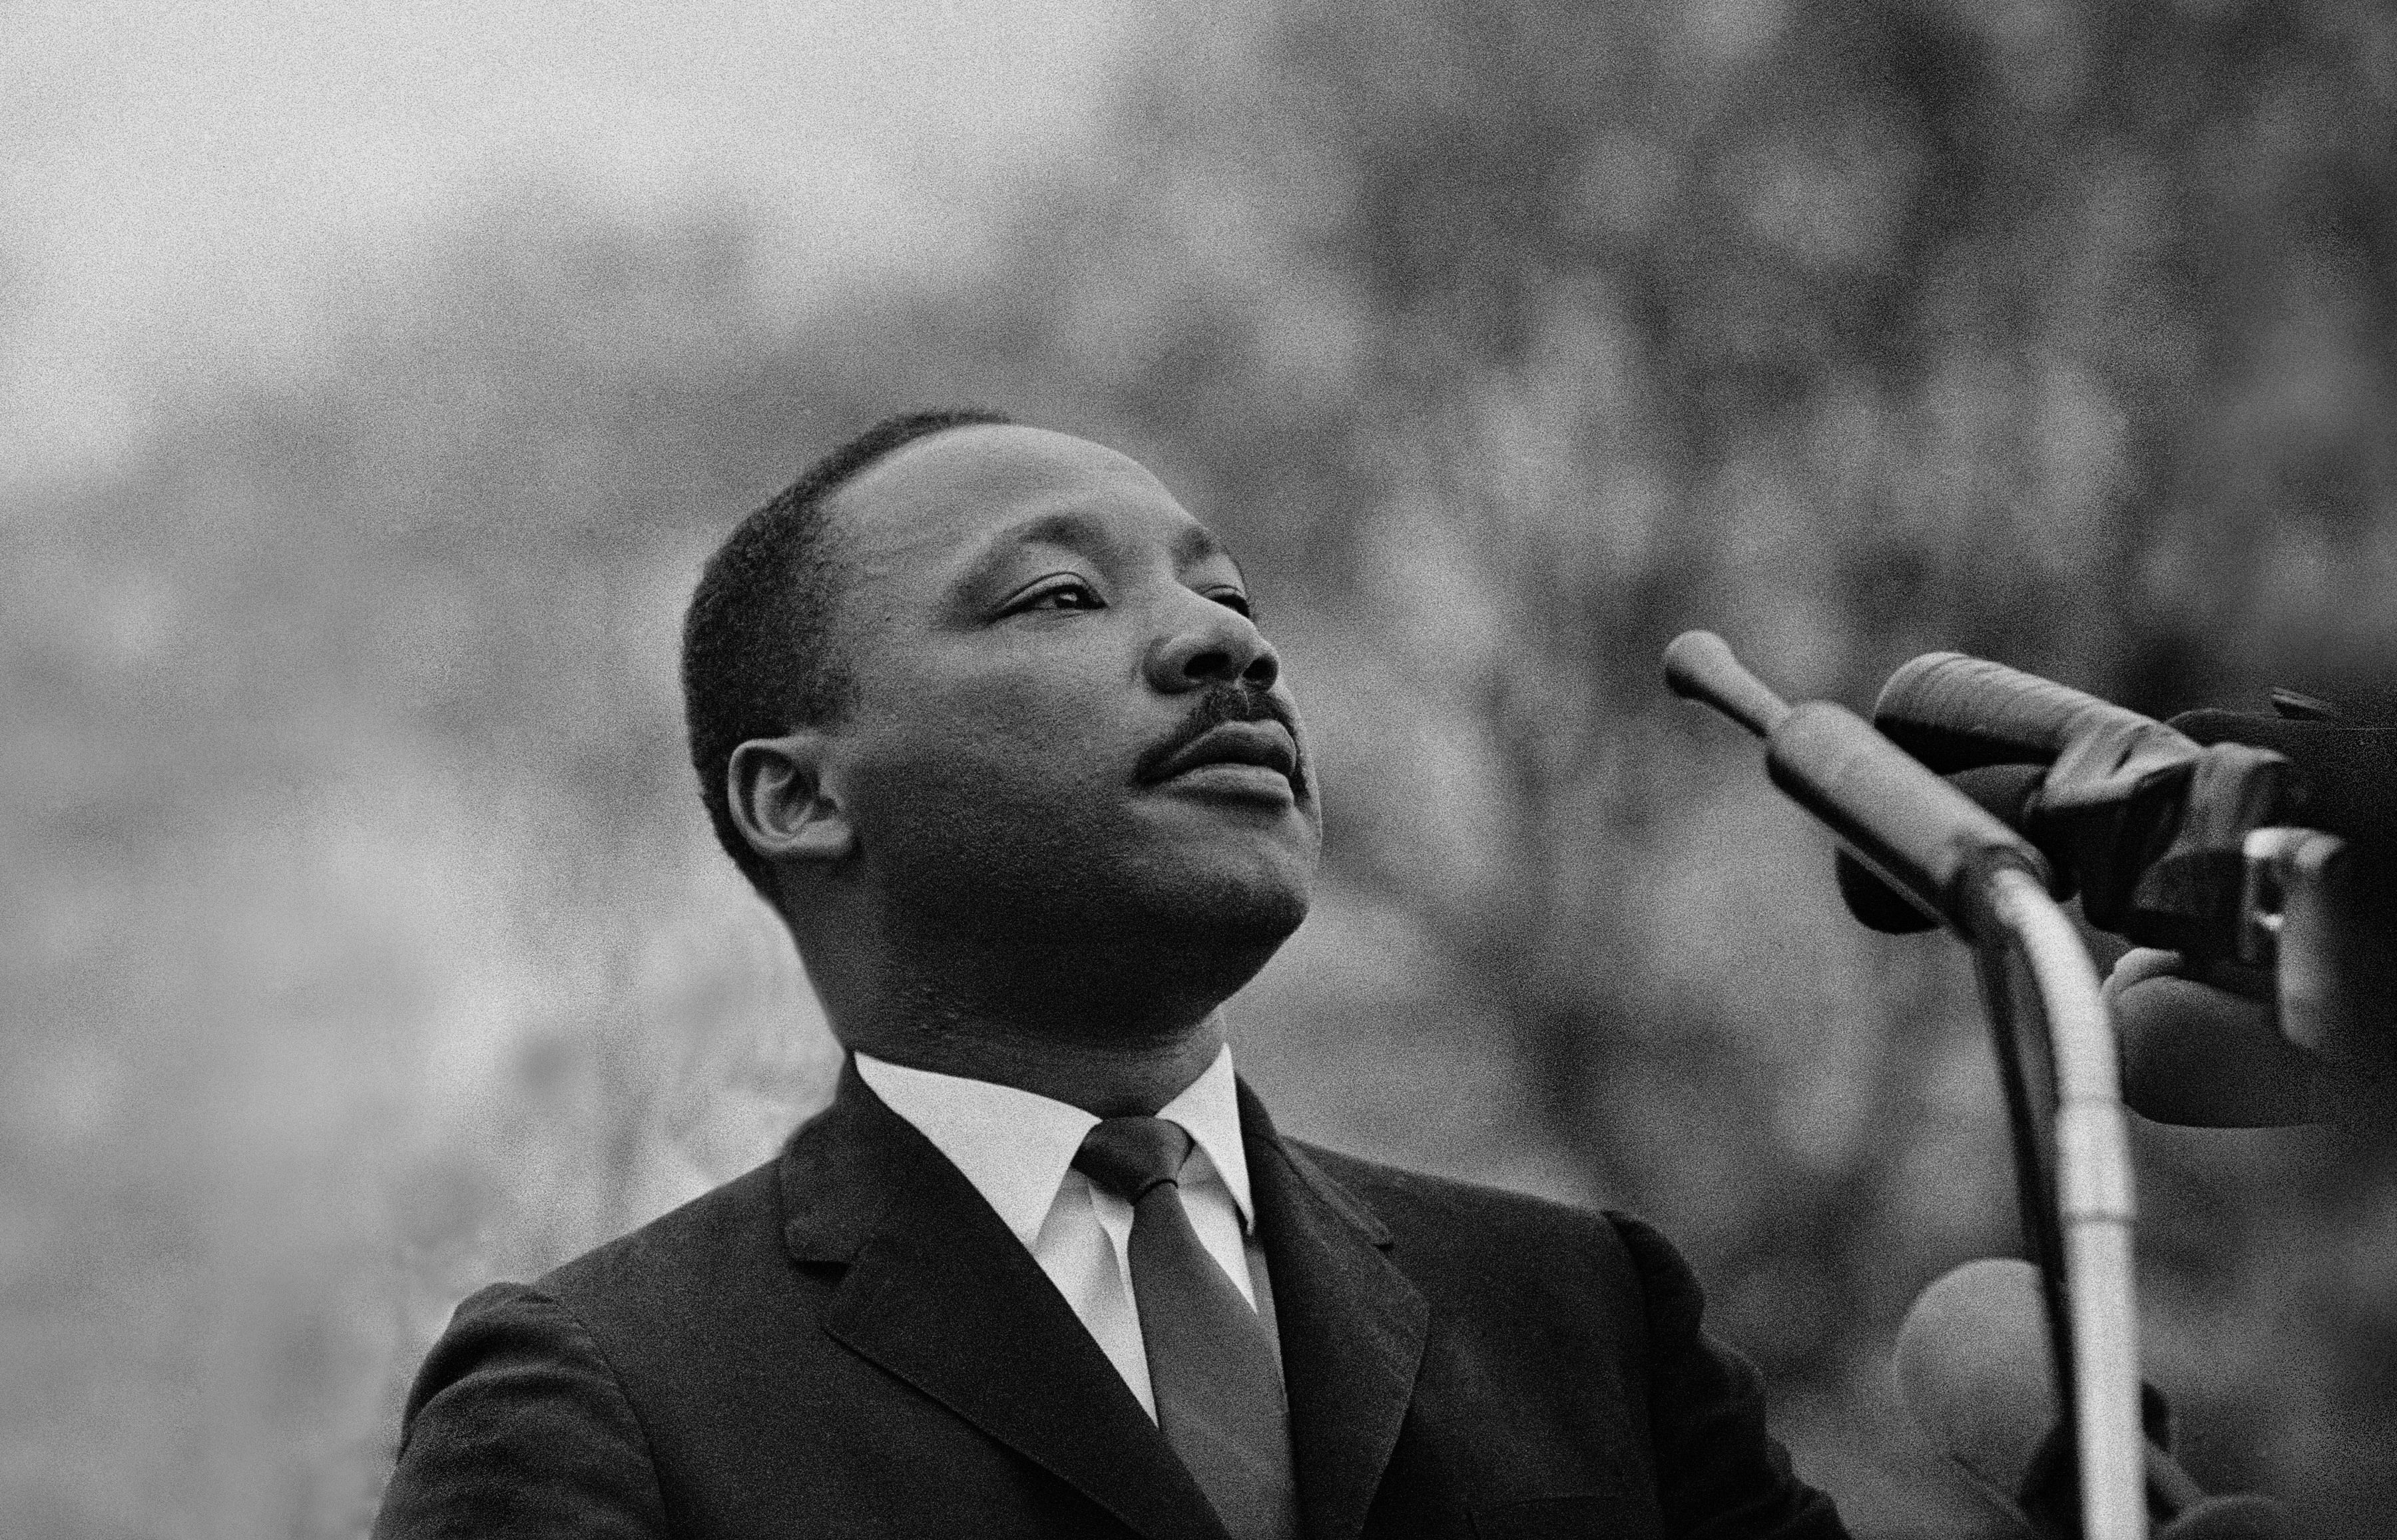 King S Landmark I Have A Dream Speech